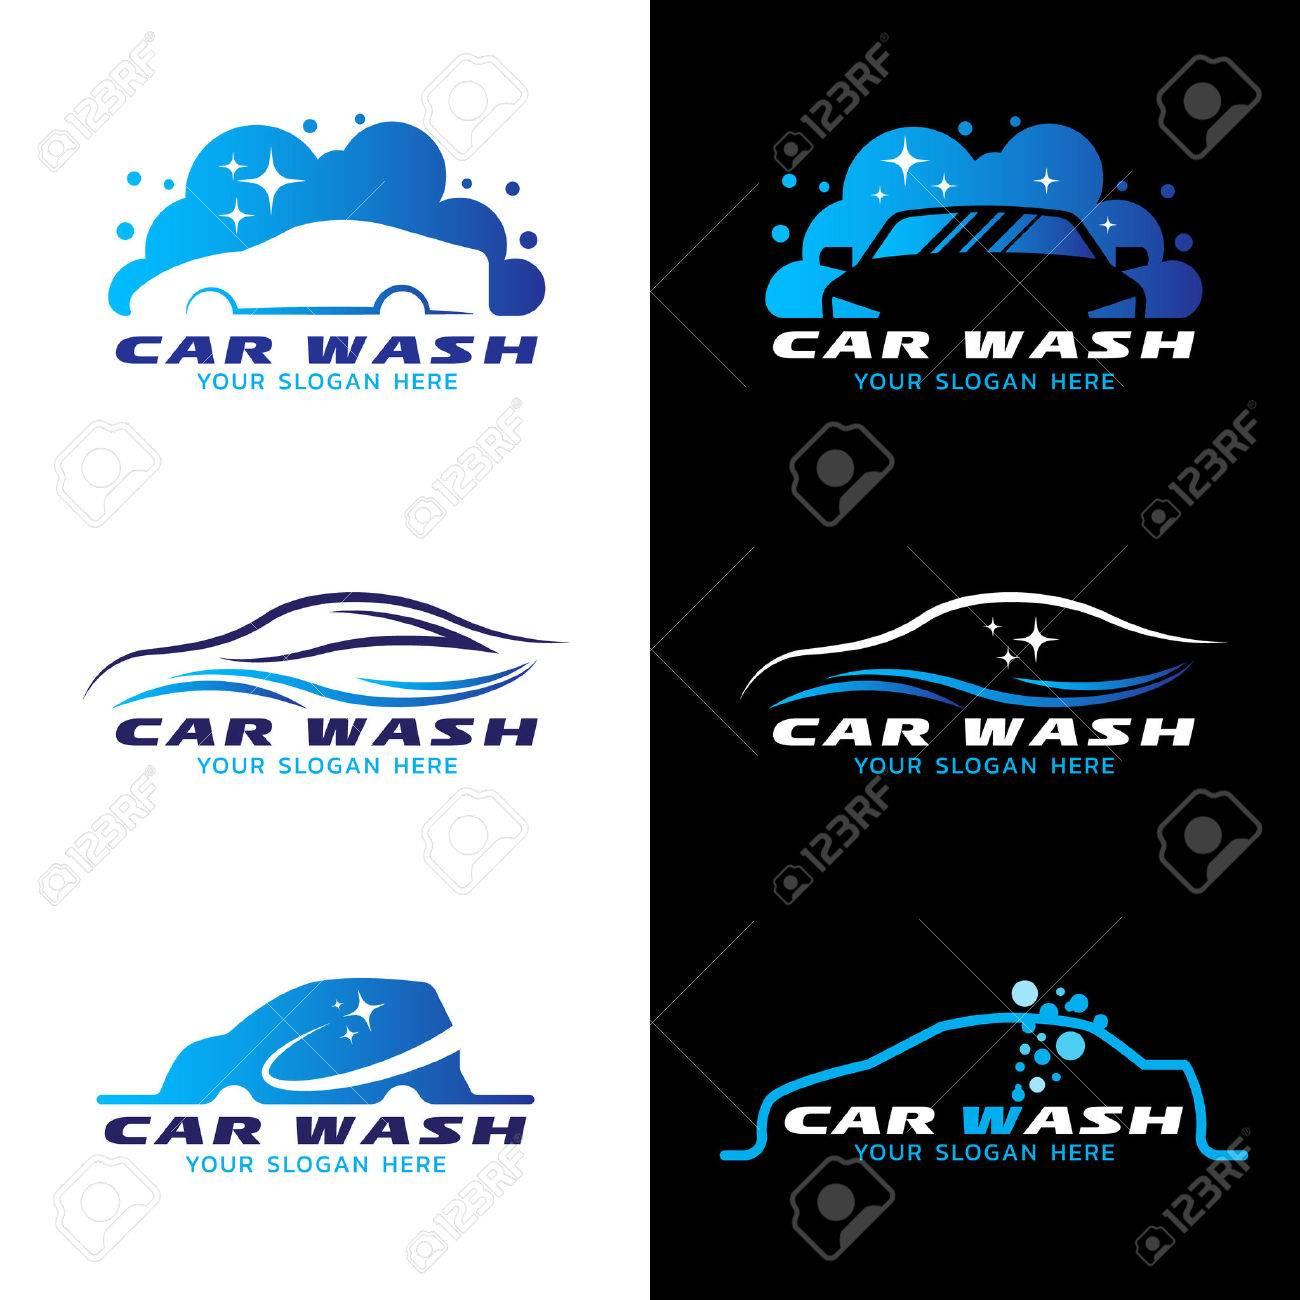 car wash service logo vector set design - 61615663